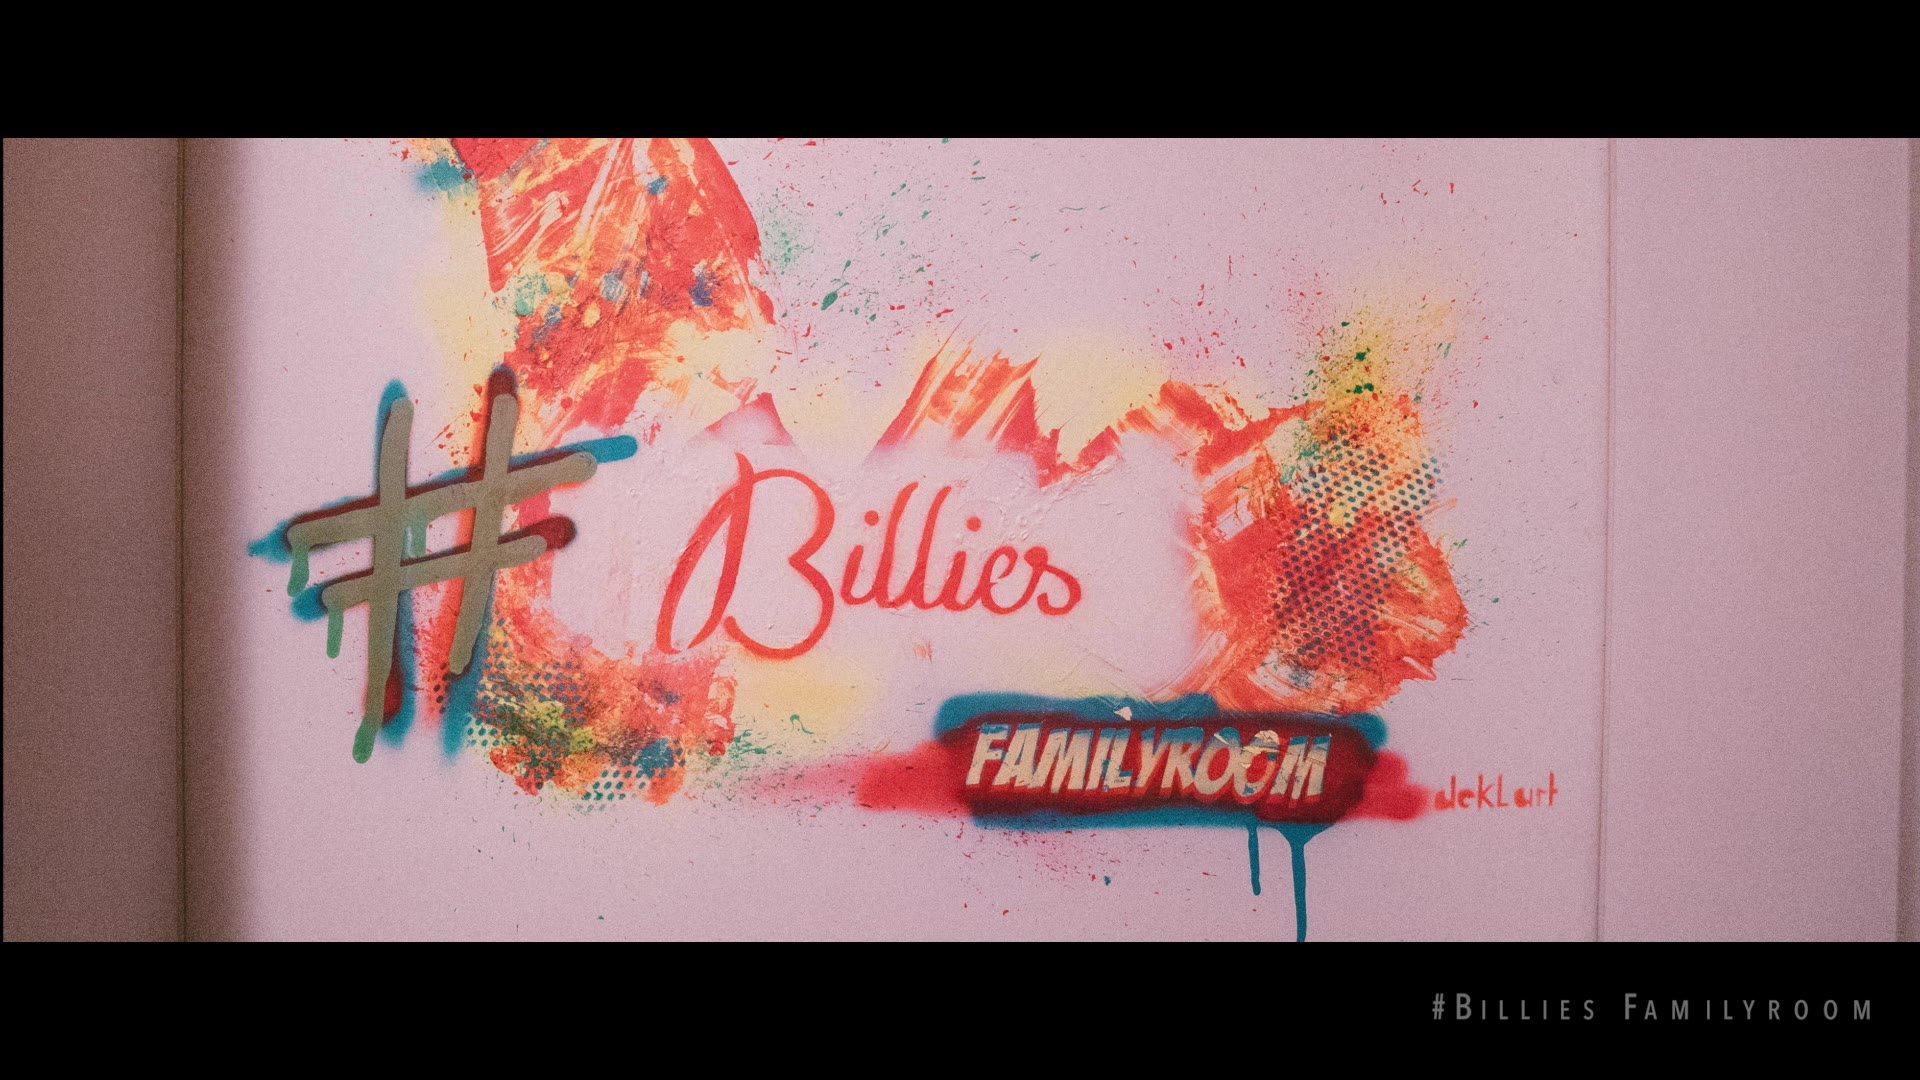 #BilliesFamilyRoom